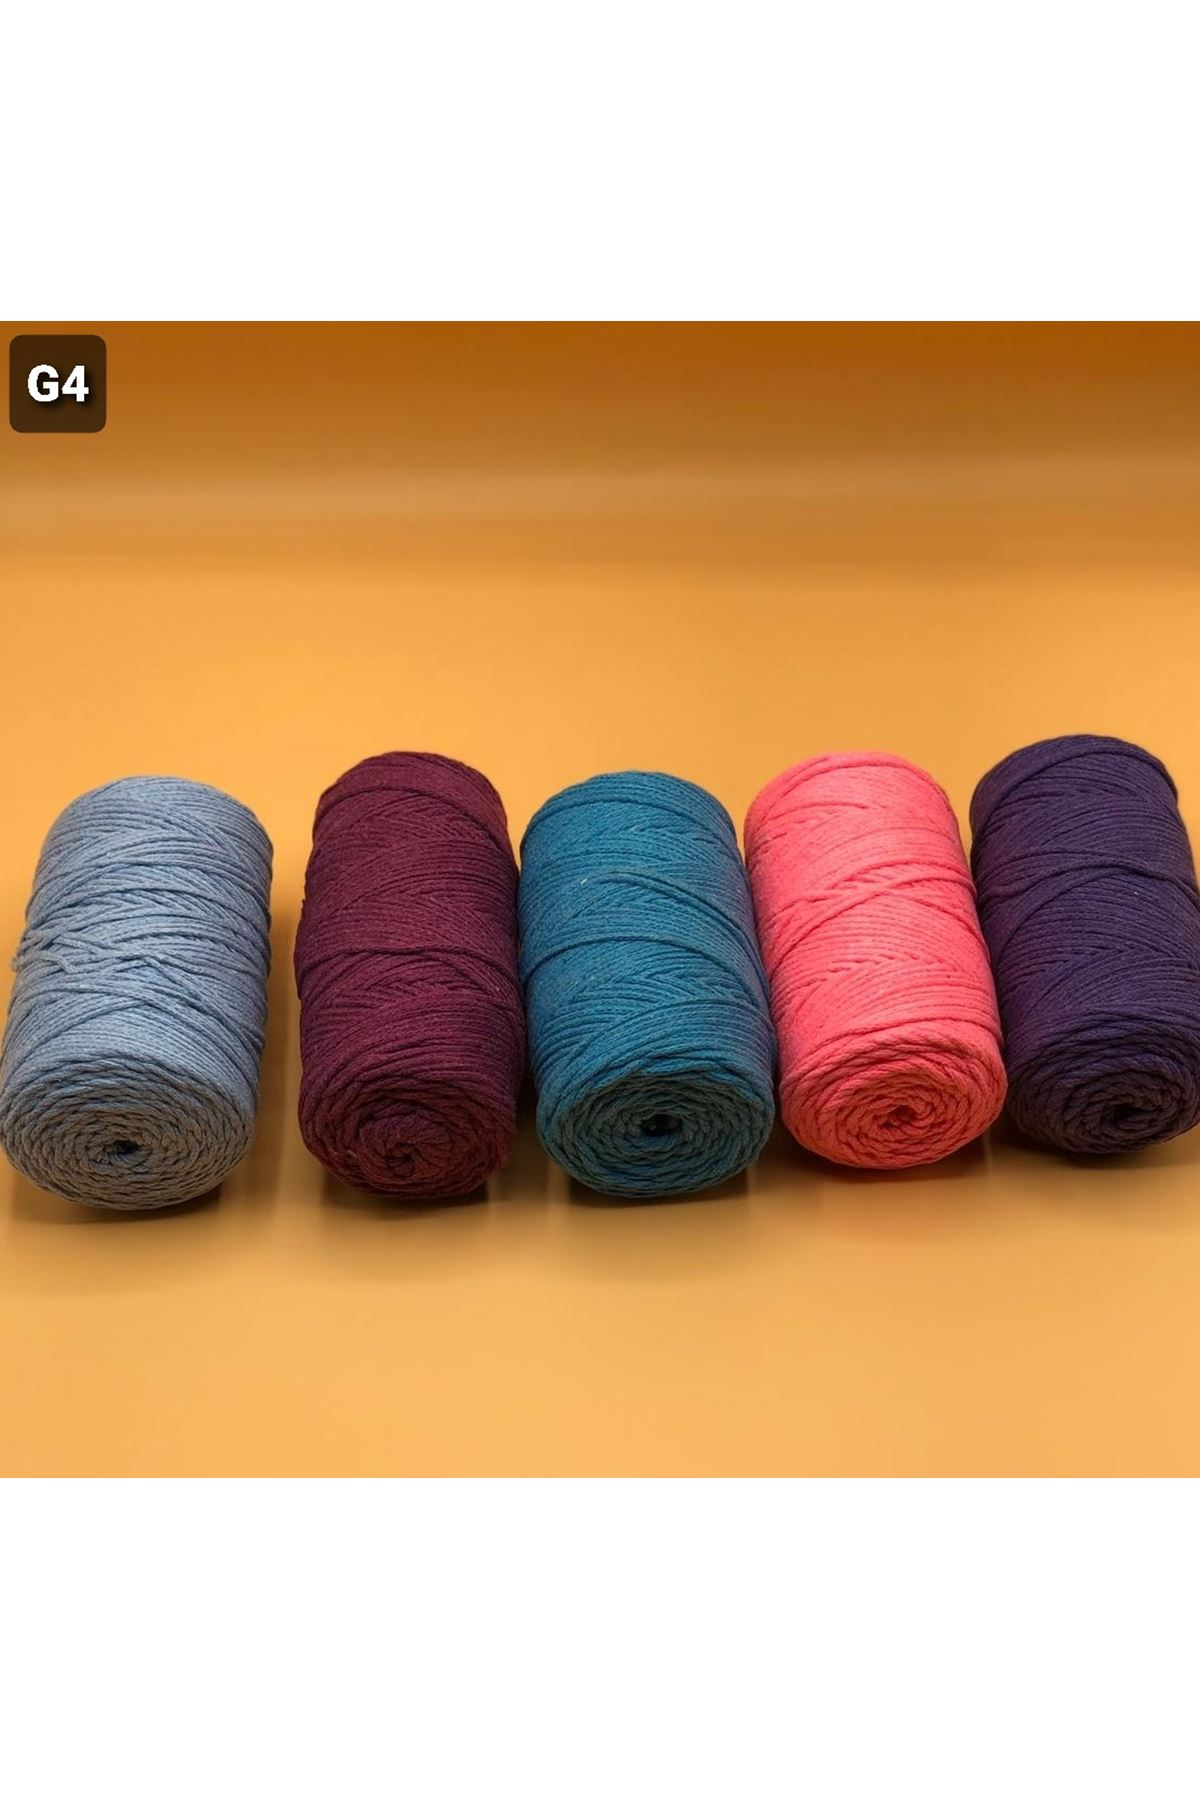 Cotton Makrome MIX Paket 1270 gram Grup 4